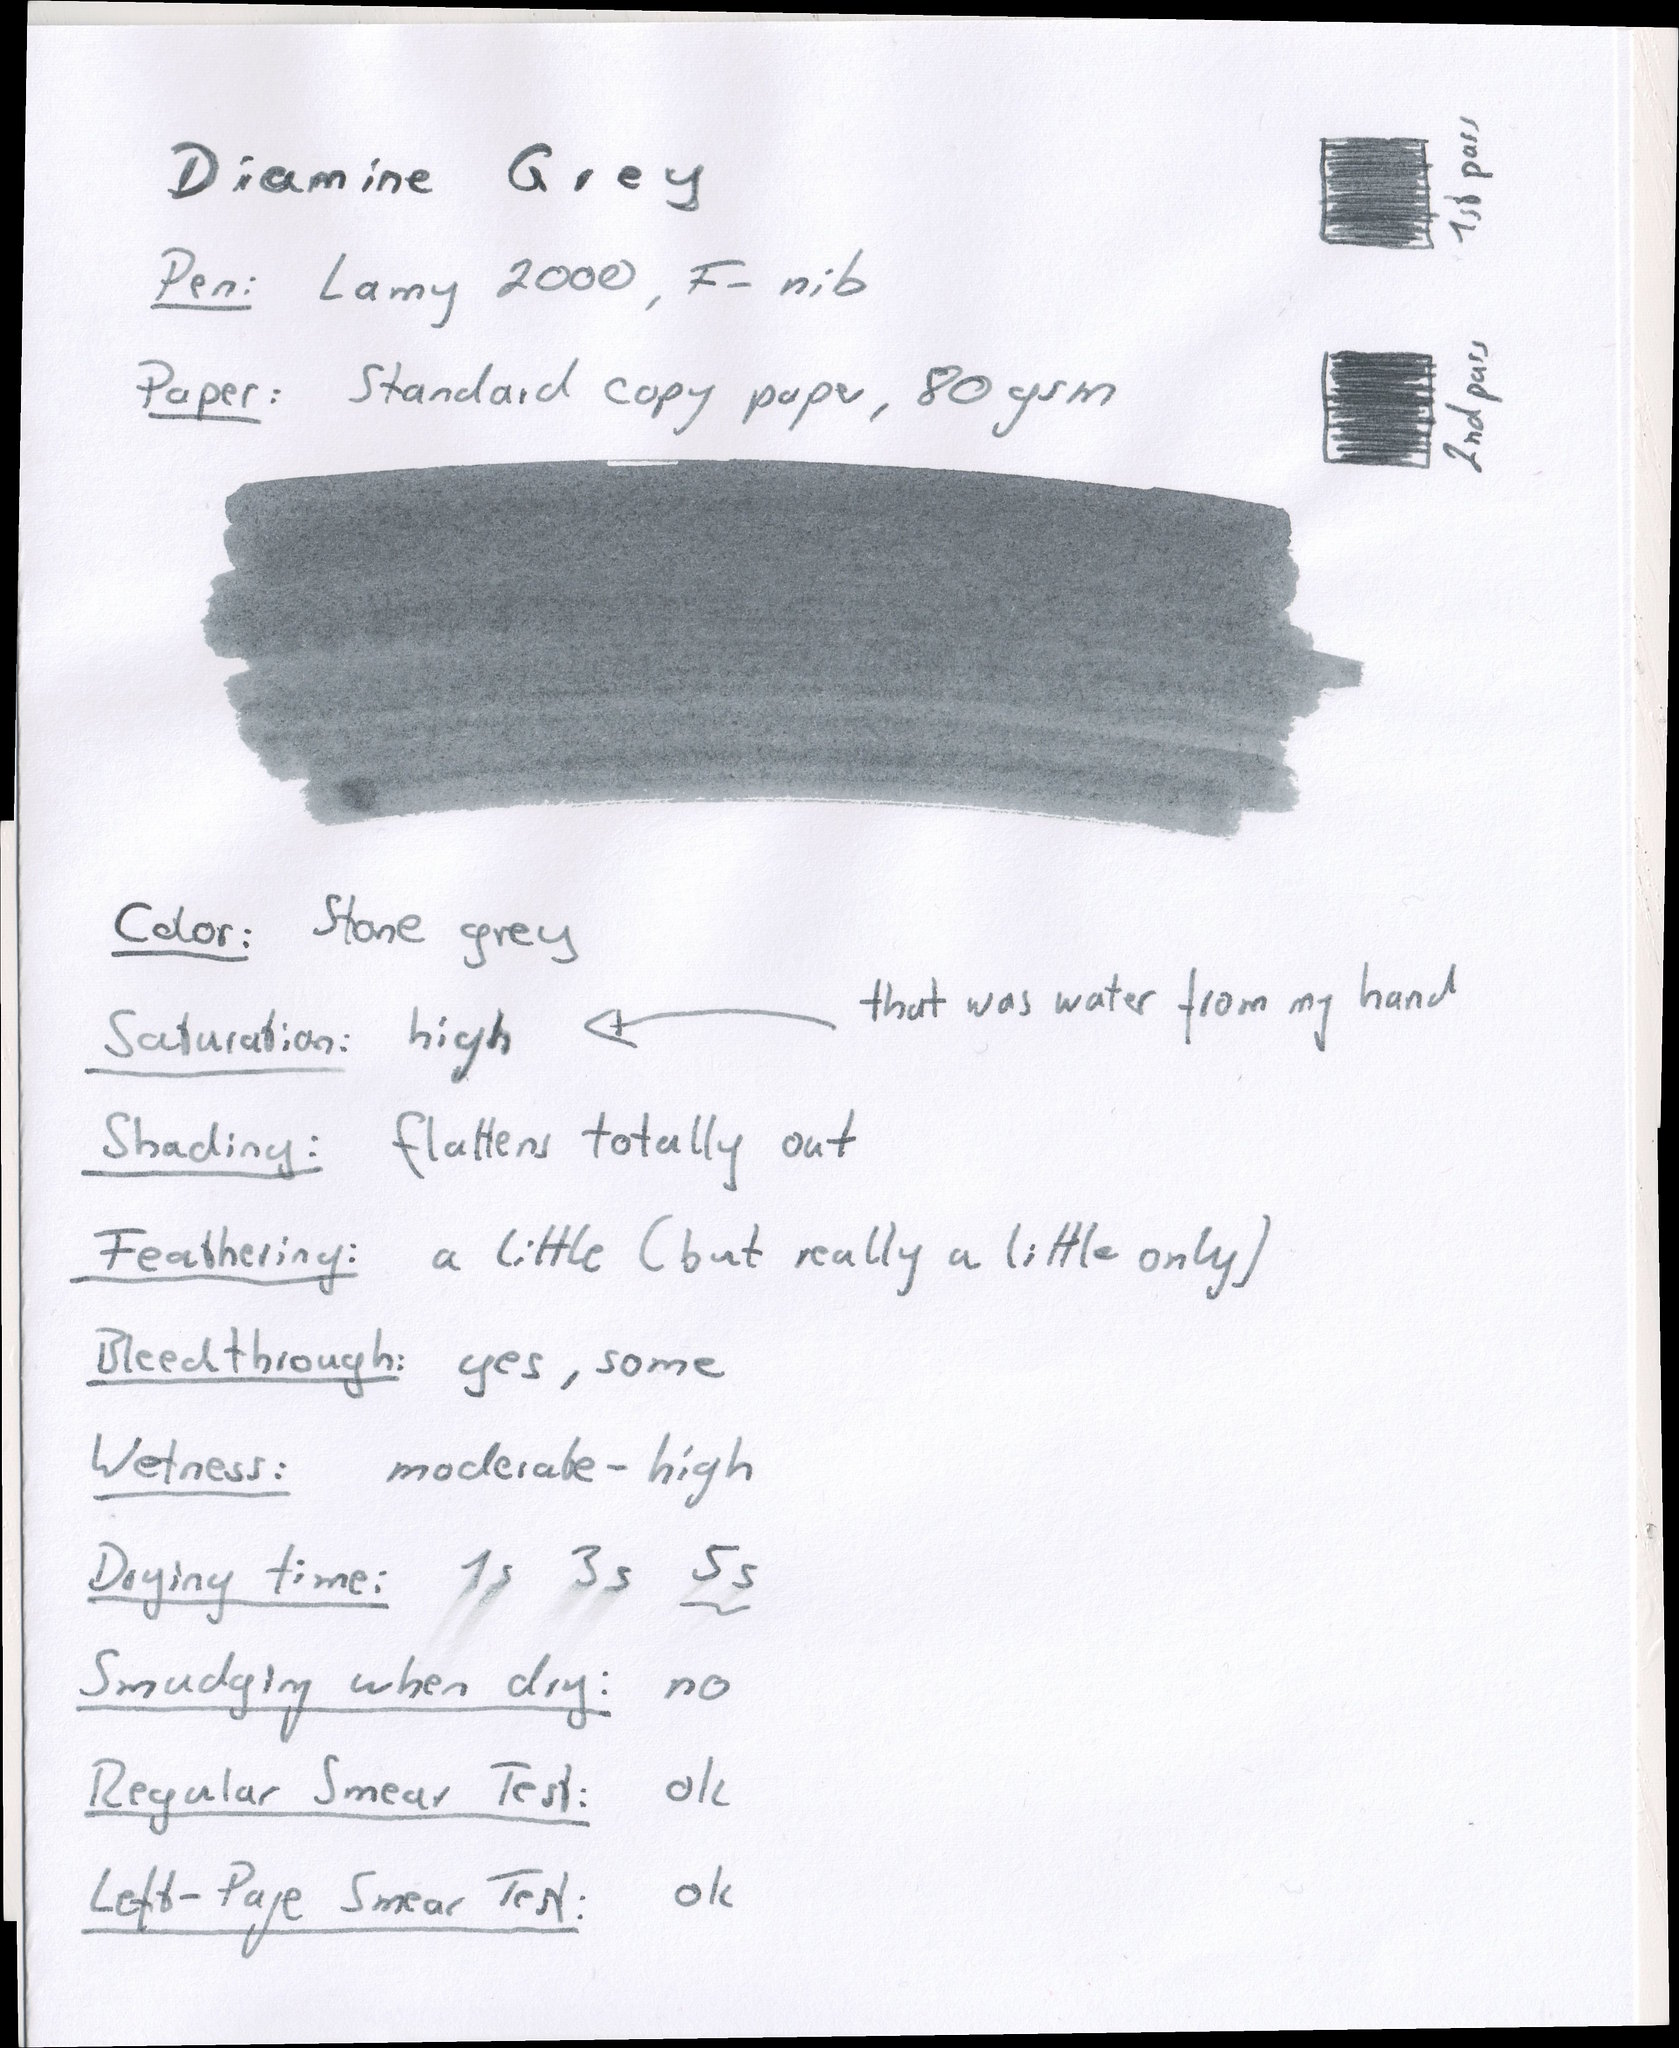 Diamine Grey on Standard Copy Paper